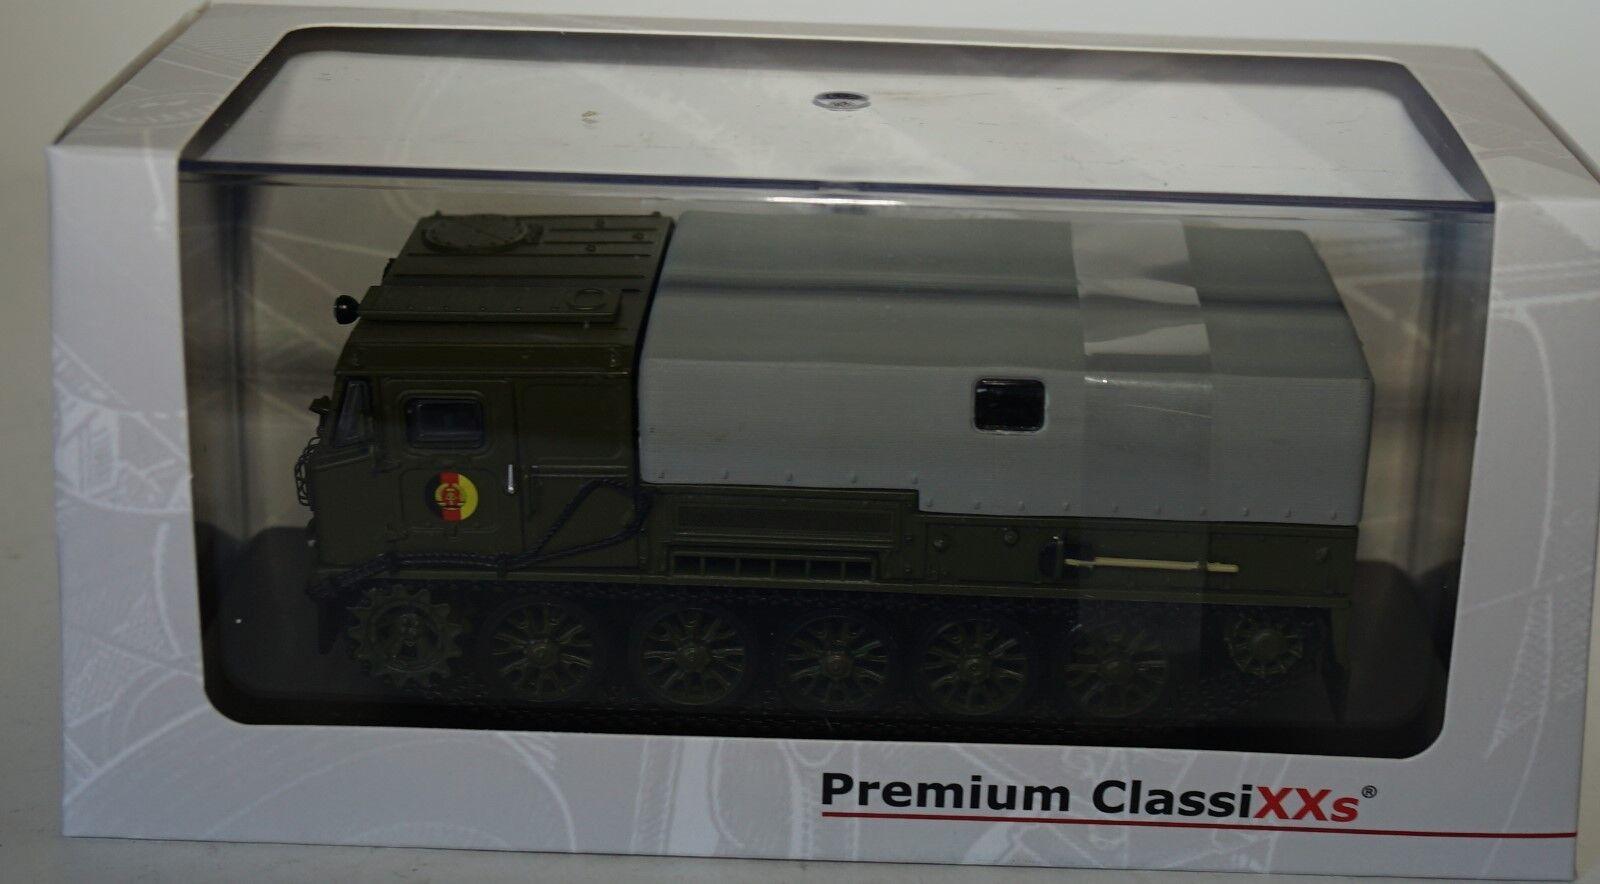 Premium Classixx 47025,à Quatre Pattes Tracteur ATS-59G ,Olive,Nva ,1 43 Echelle